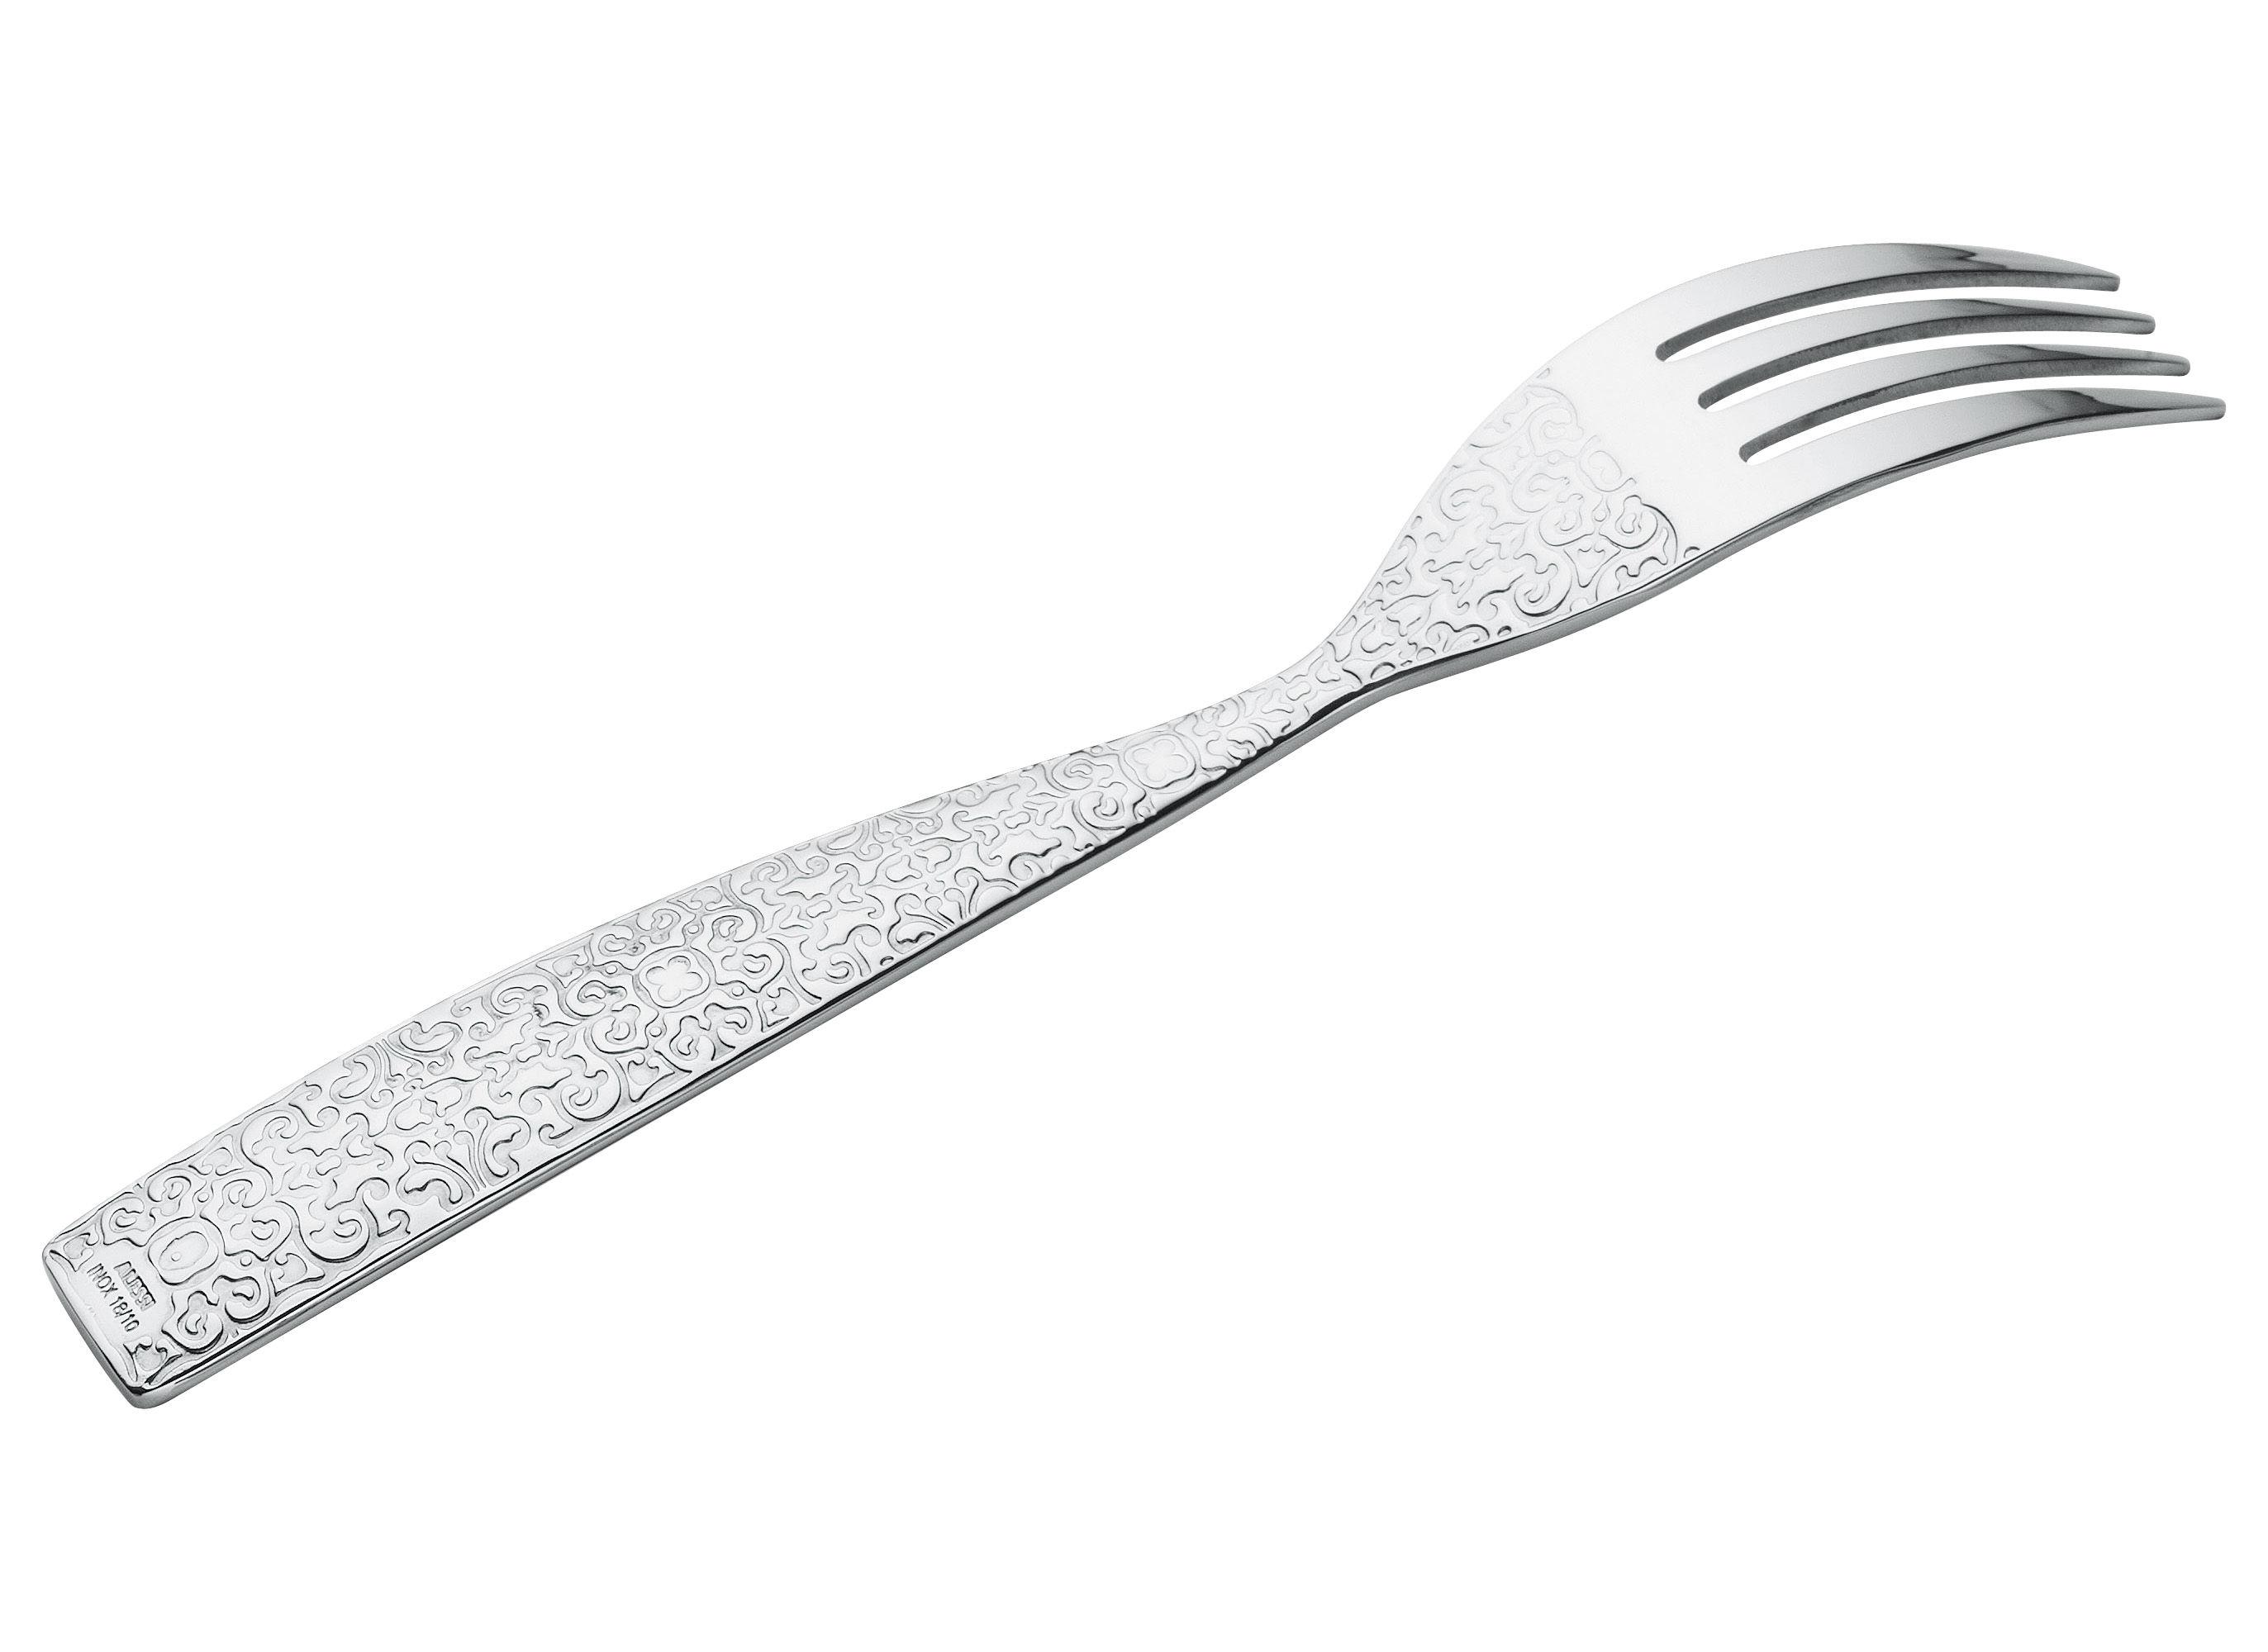 Tischkultur - Bestecke - Dressed Gabel - Alessi - Tafelgabel - Edelstahl - rostfreier Stahl